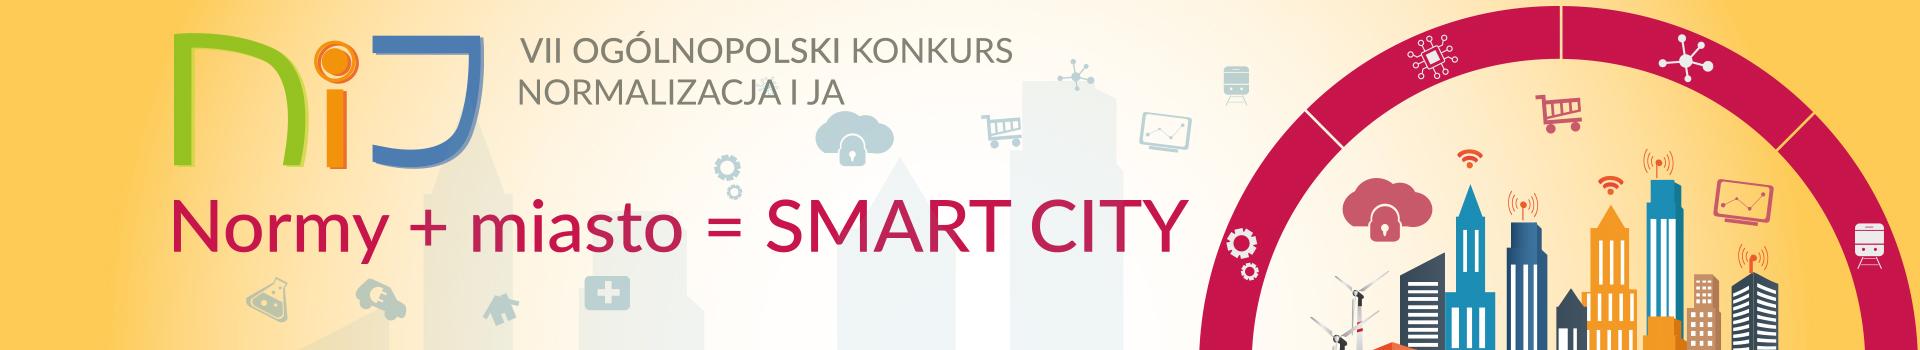 "VII Ogólnopolski Konkurs ""Normalizacja i ja"" tym razem SMART CITY"